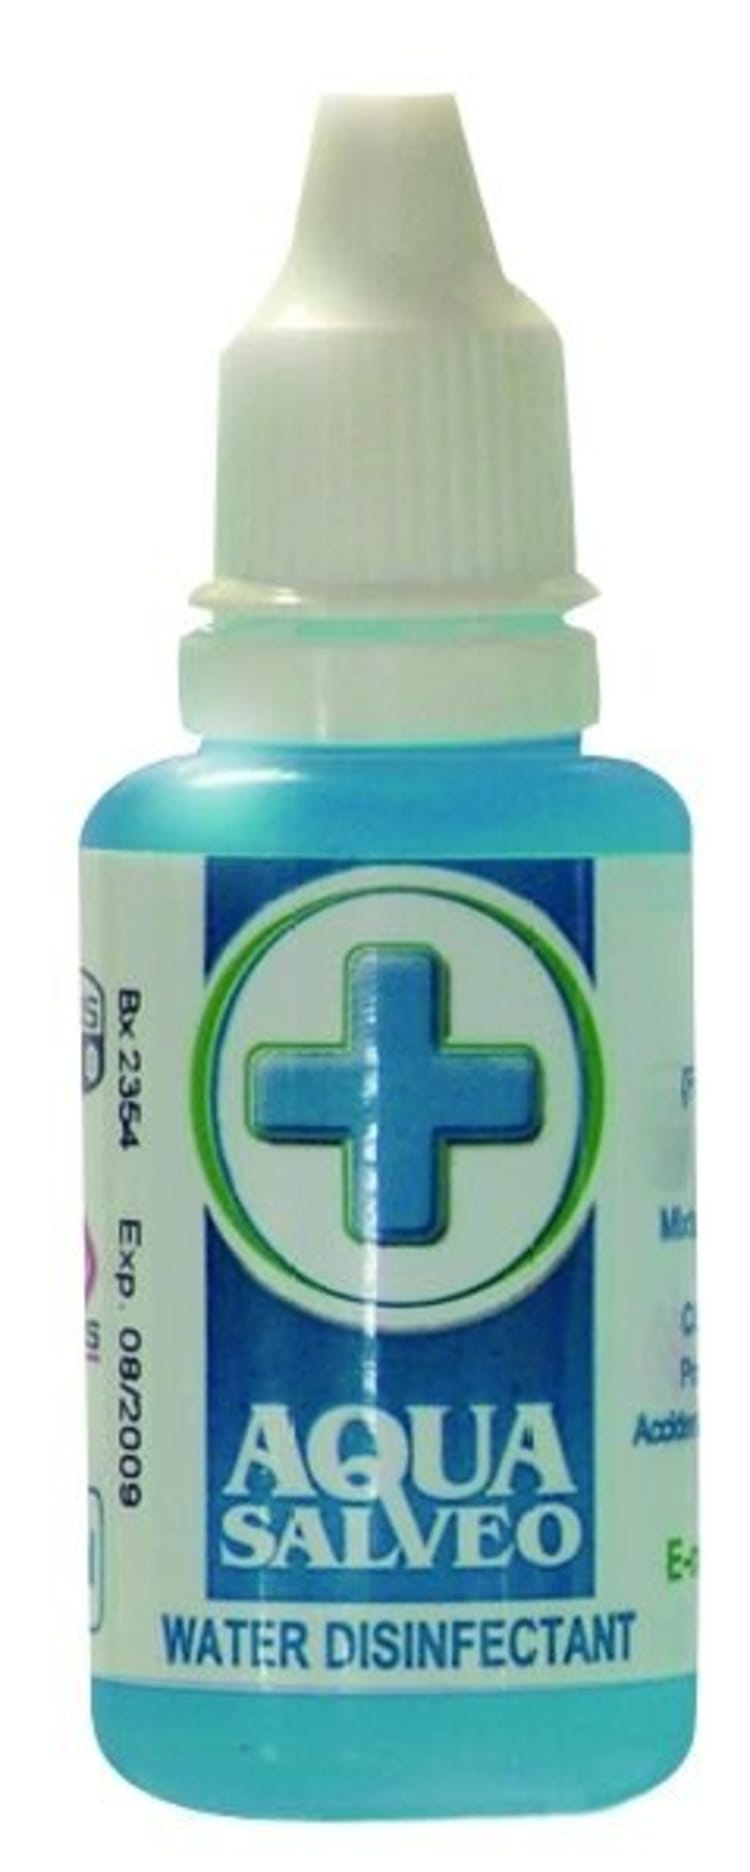 Aqua Salveo Water Disinfectant 30ml Retail Pack - default